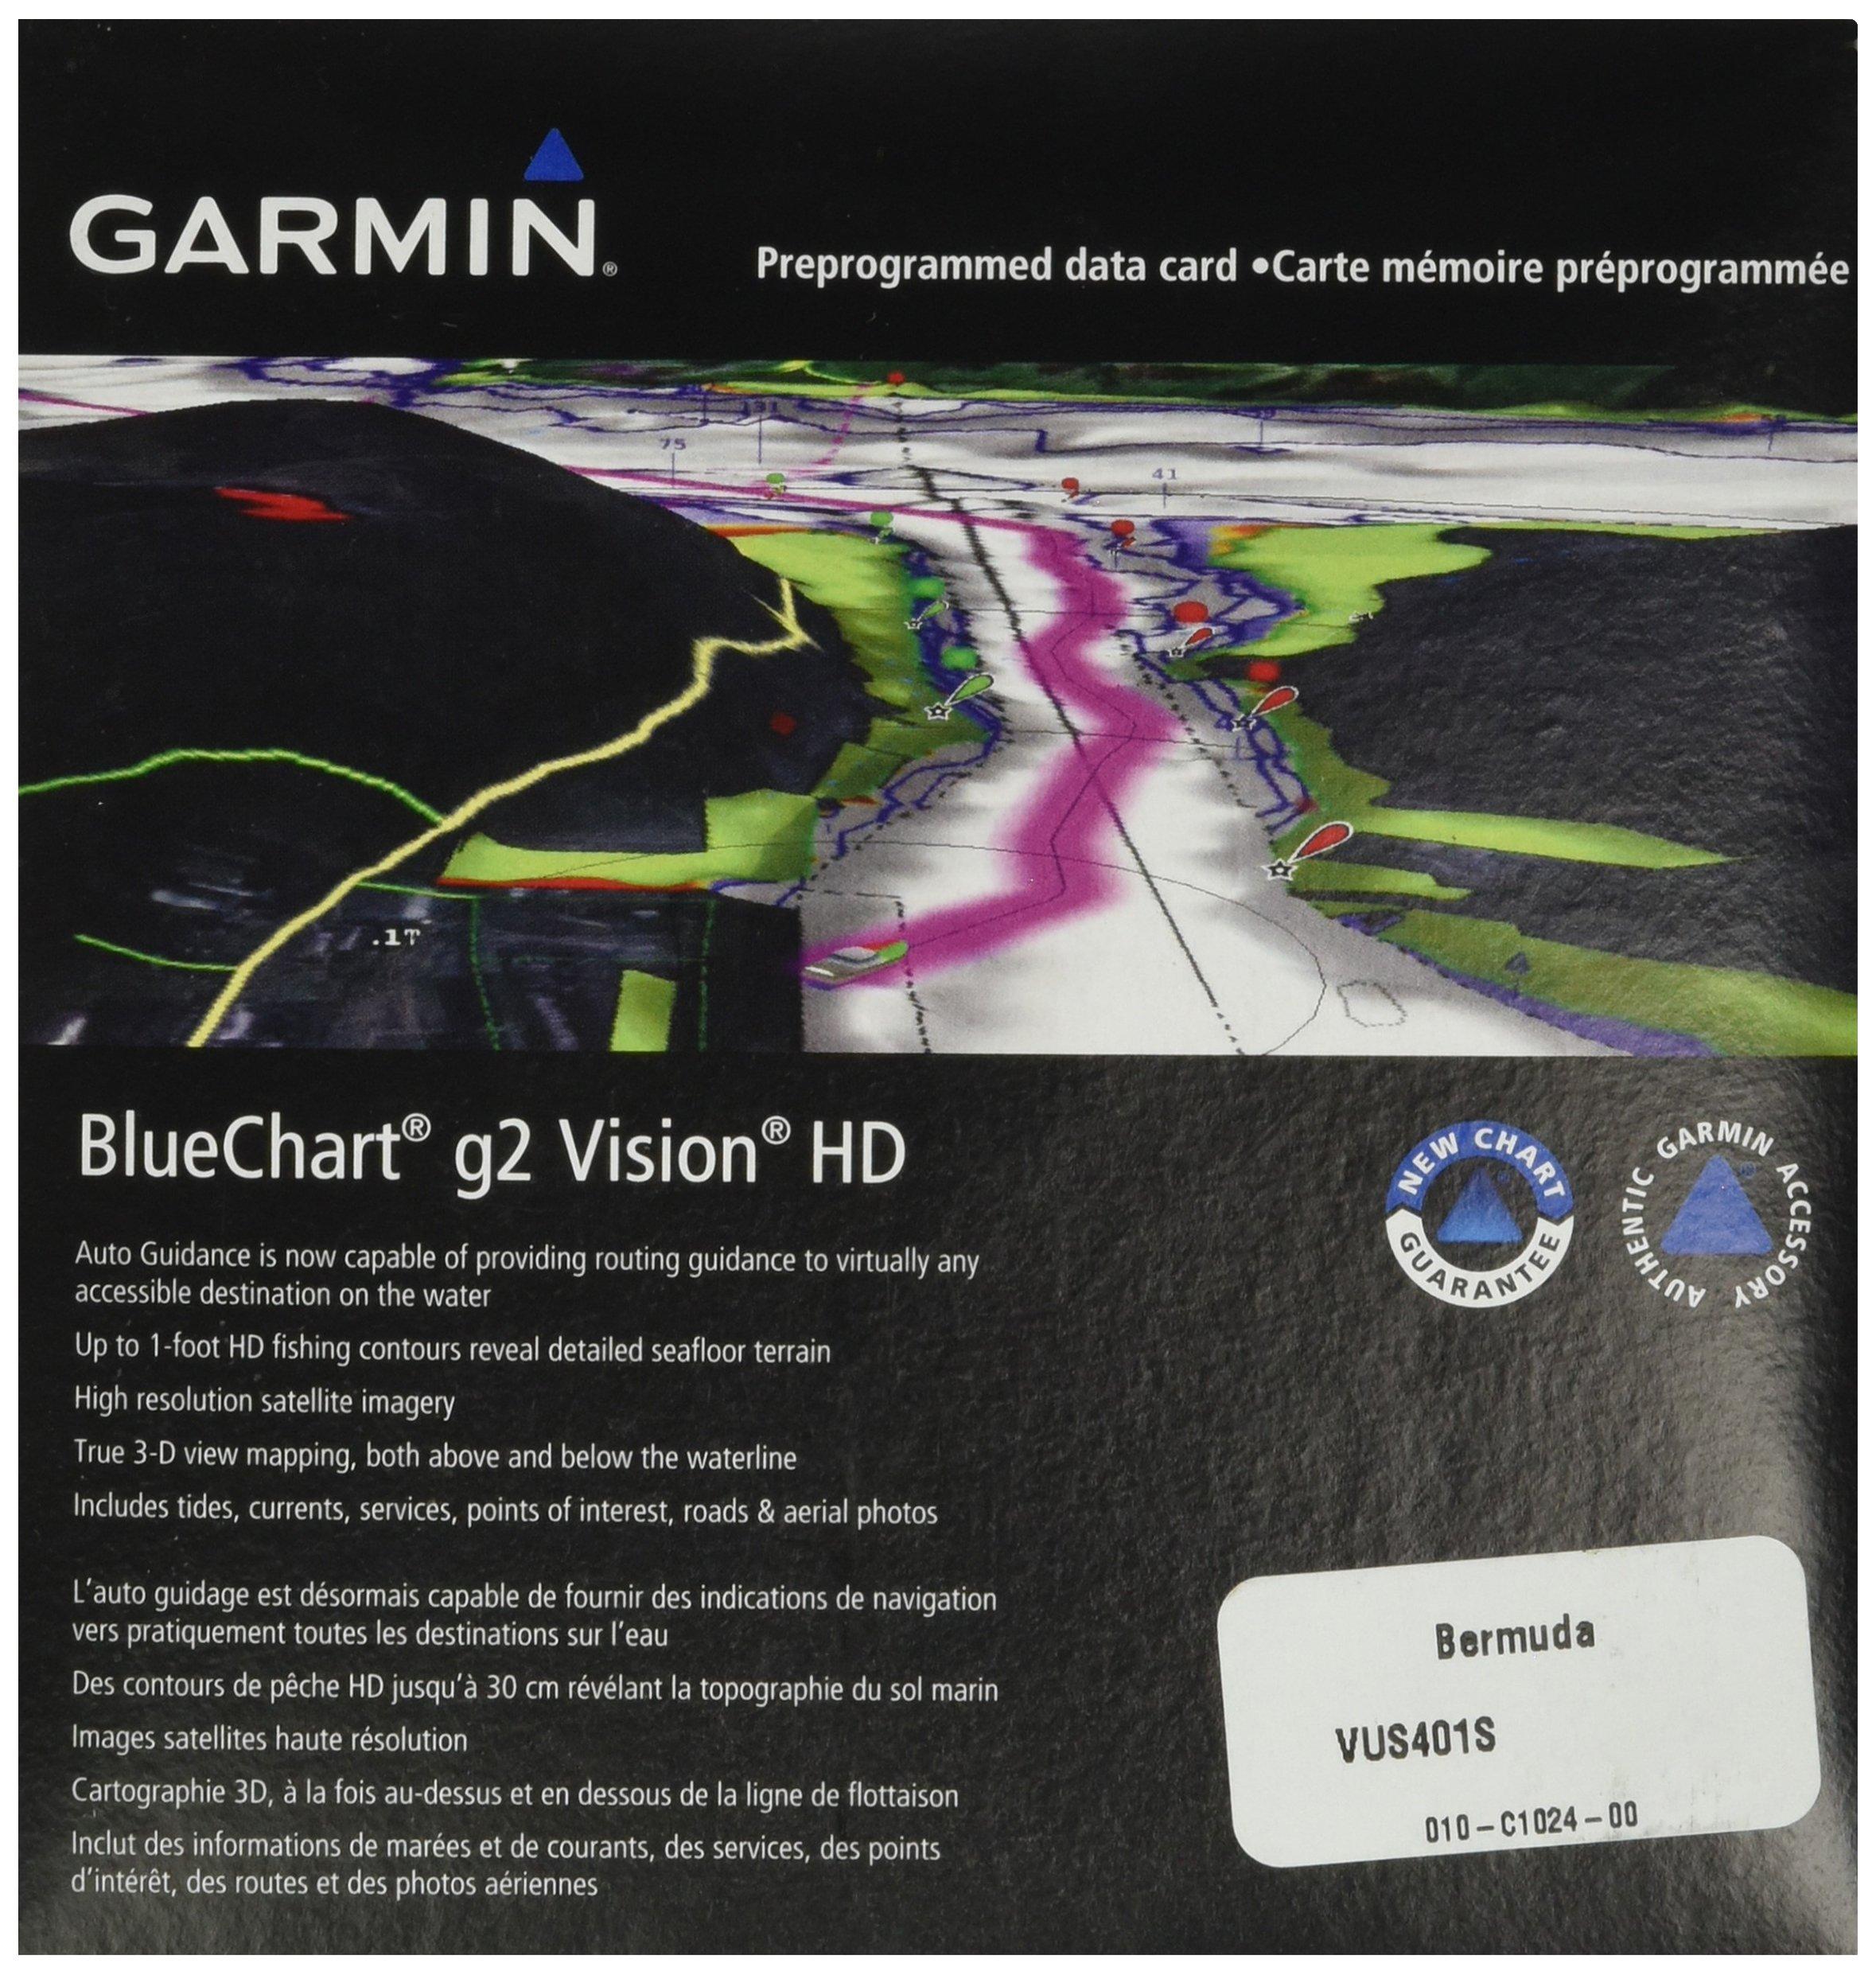 Garmin BlueChart g2 Vision Bermuda Saltwater Map microSD Card by Garmin